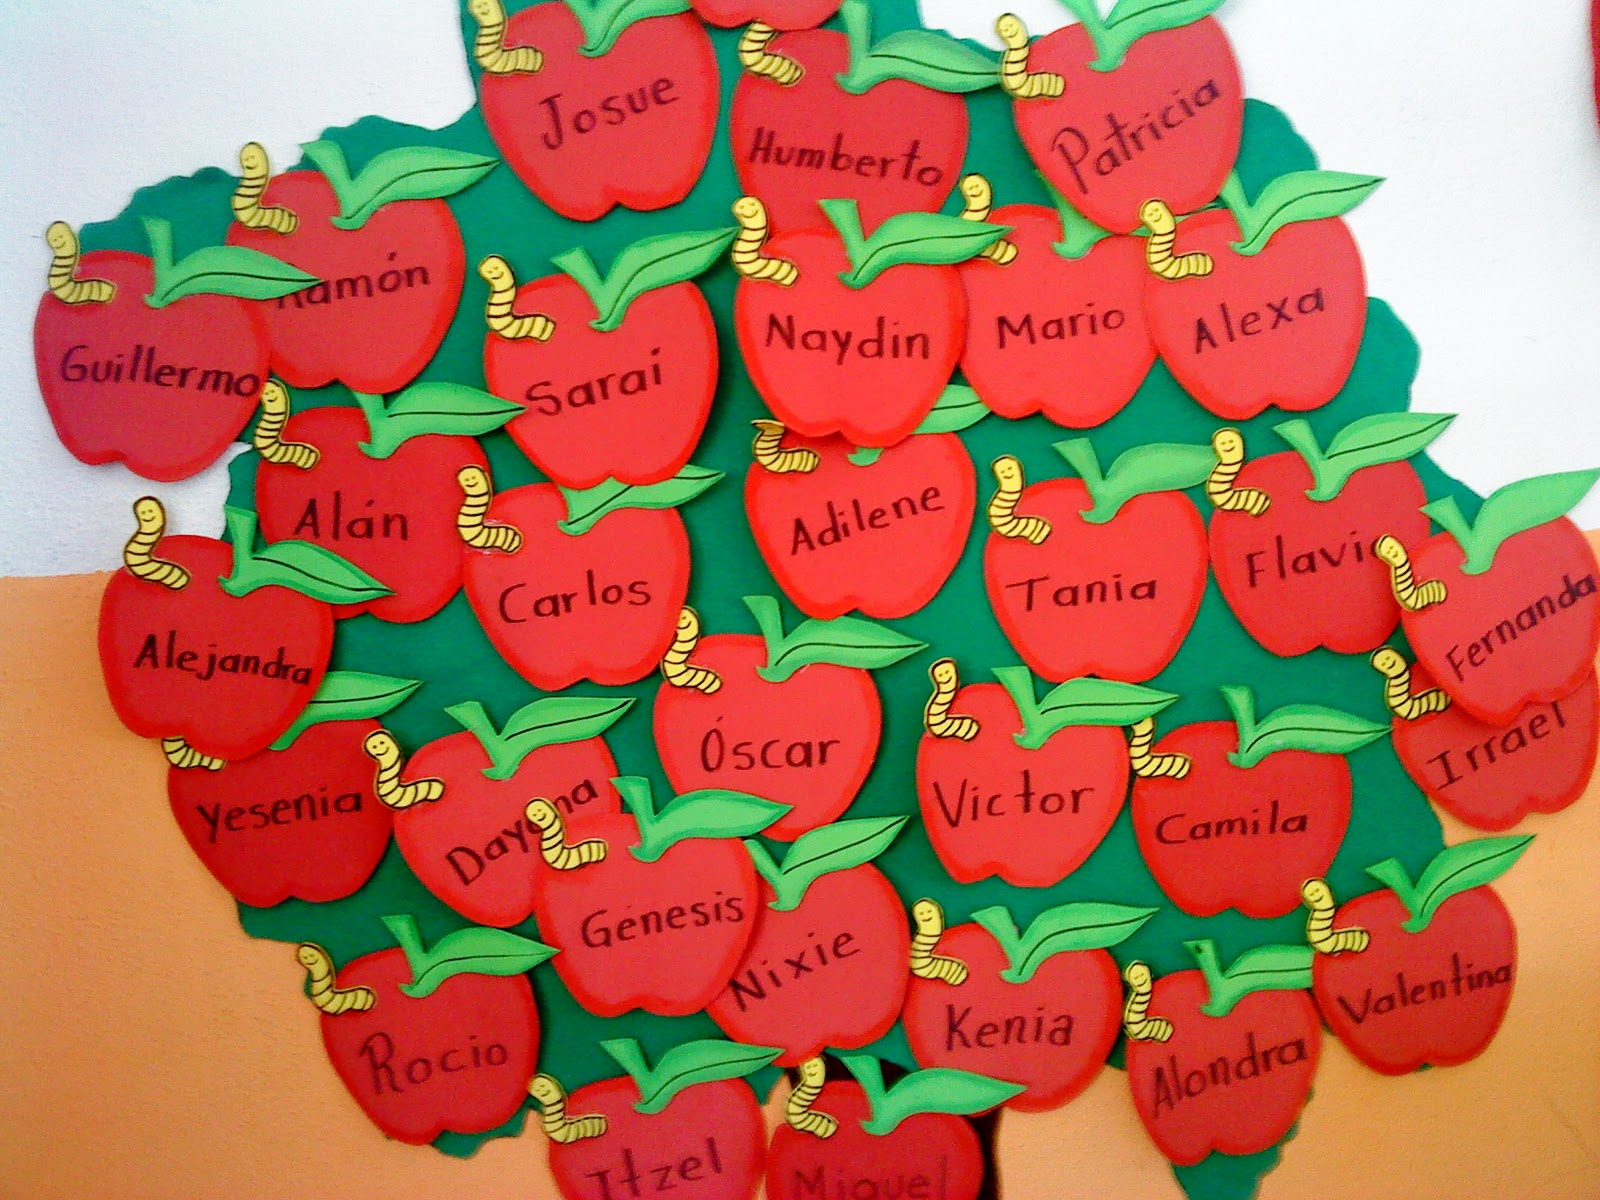 Mis peque as manualidades 21 ene 2011 for Lista de arboles perennes